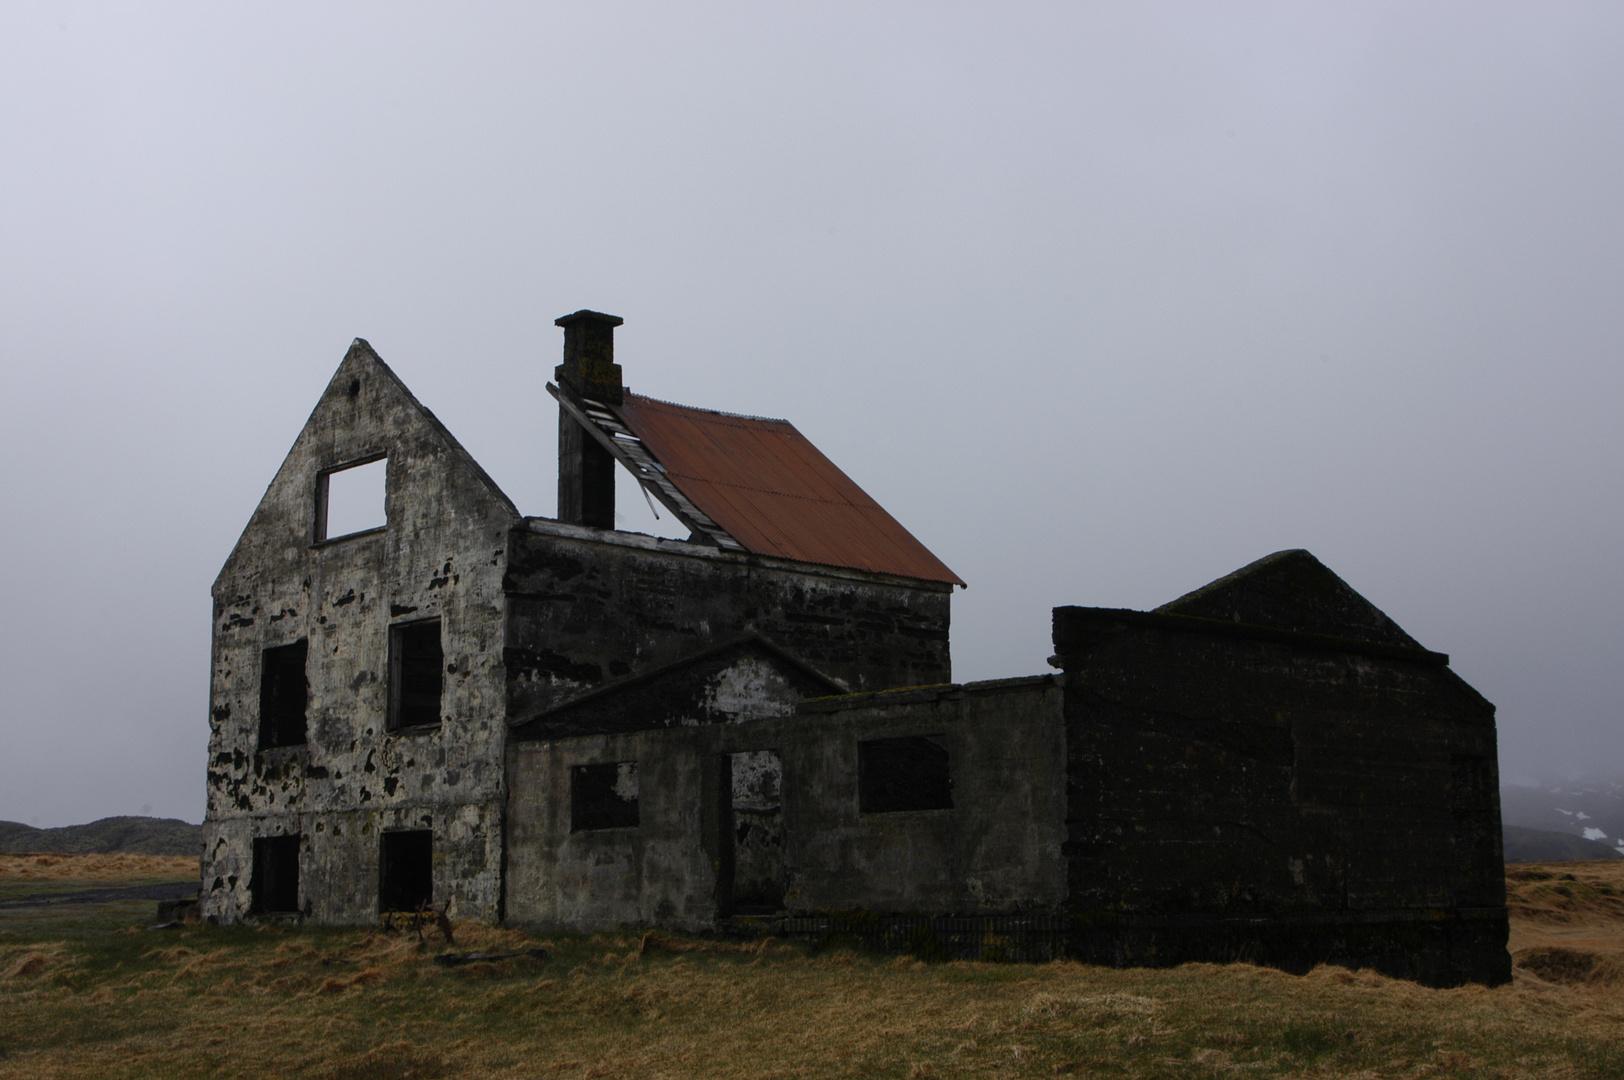 Geisterhaus II